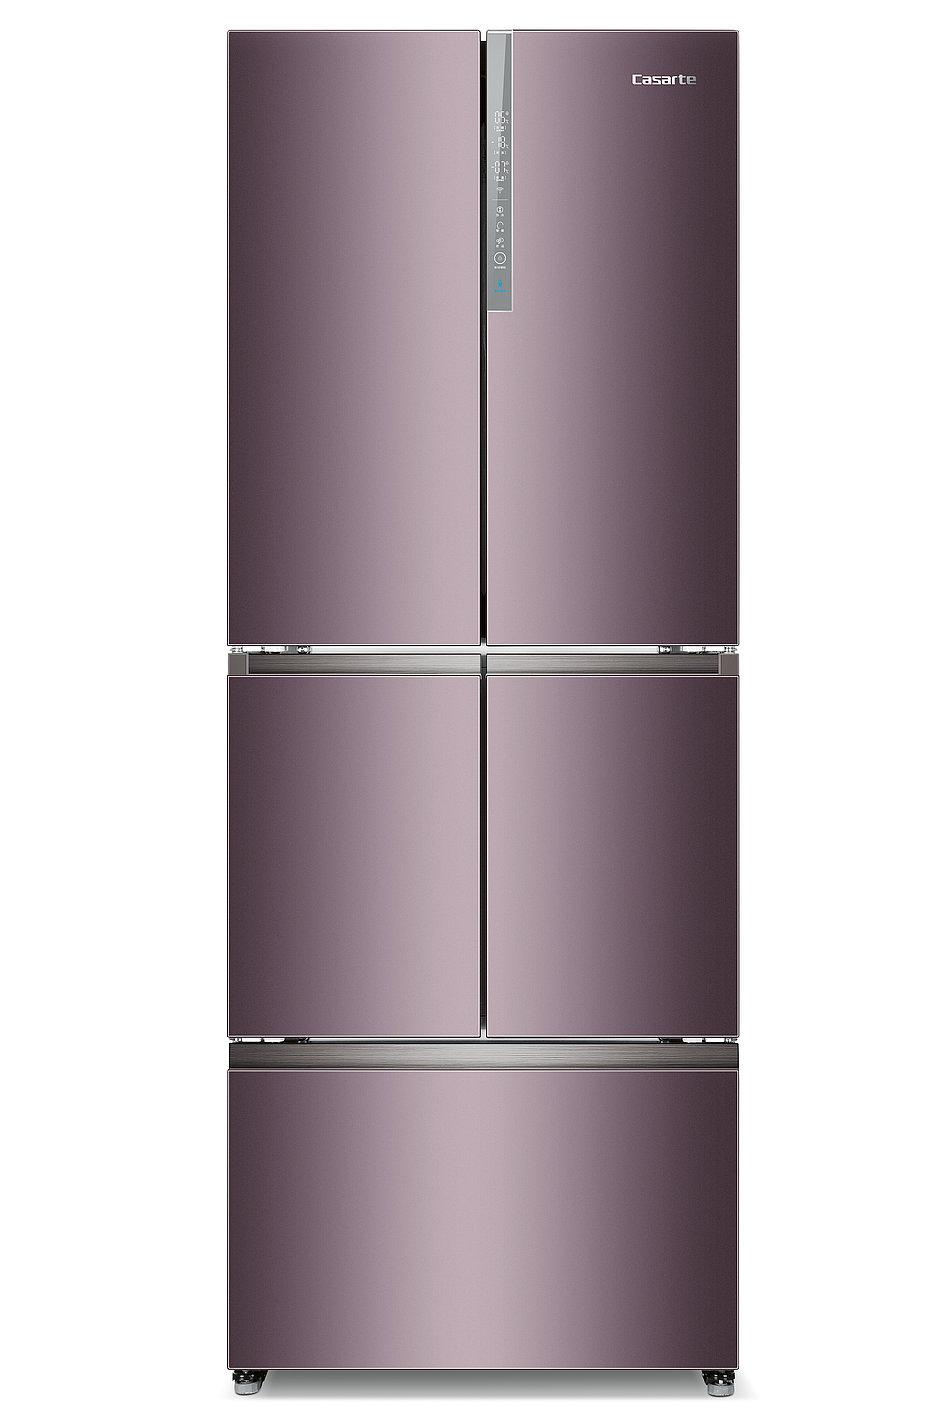 Casarte 420 F+ Refrigerator   Red Dot Design Award